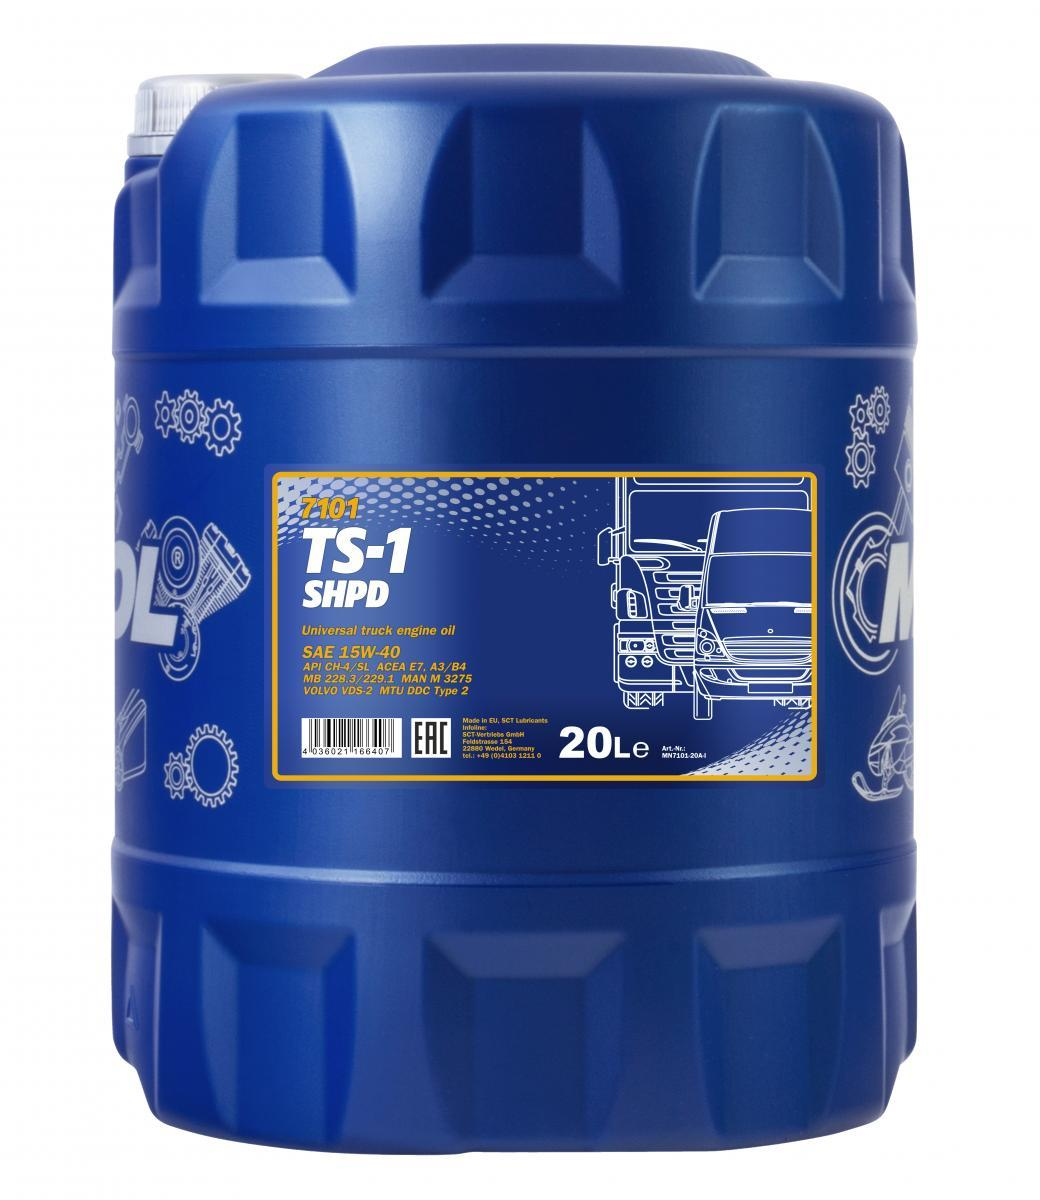 MANNOL TS-1, SHPD MN7101-20 Motoröl